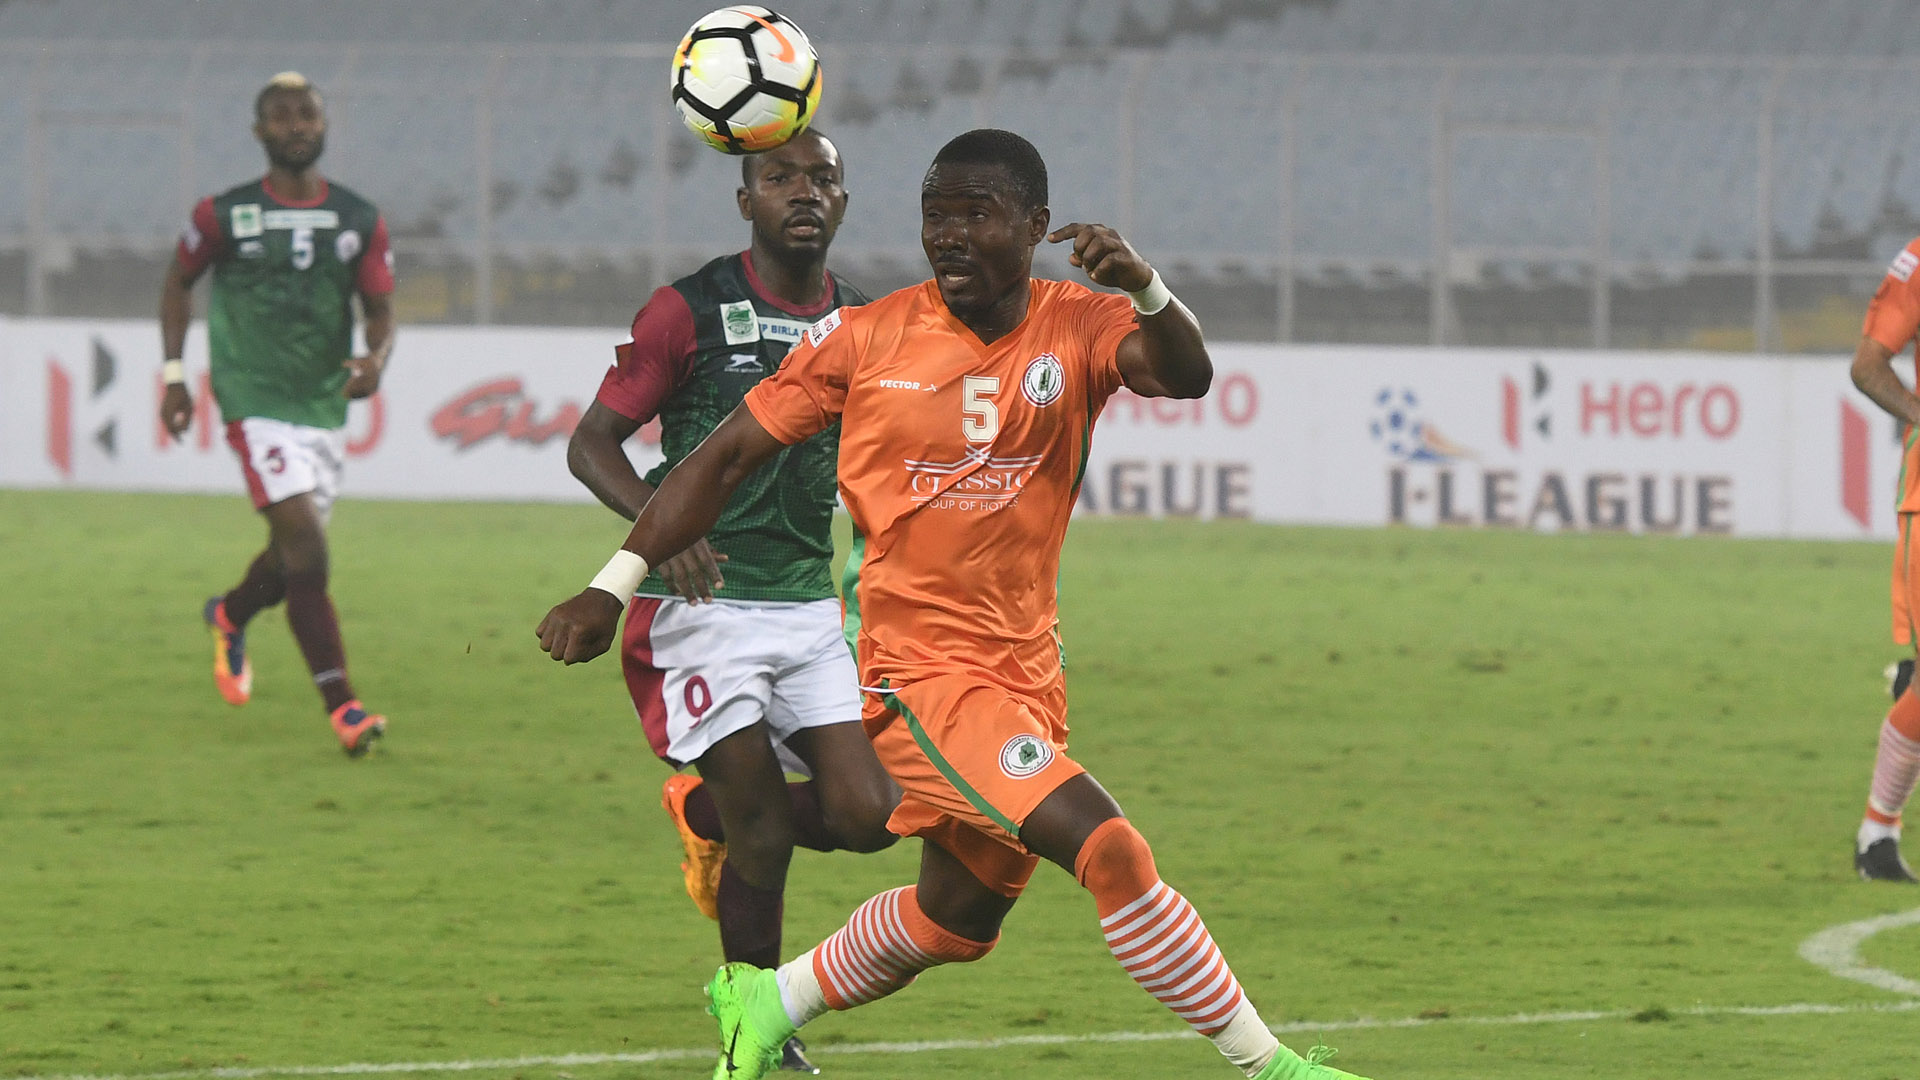 Kallon Kiatamba Mohun Bagan NEROCA FC I-League 2017/2018